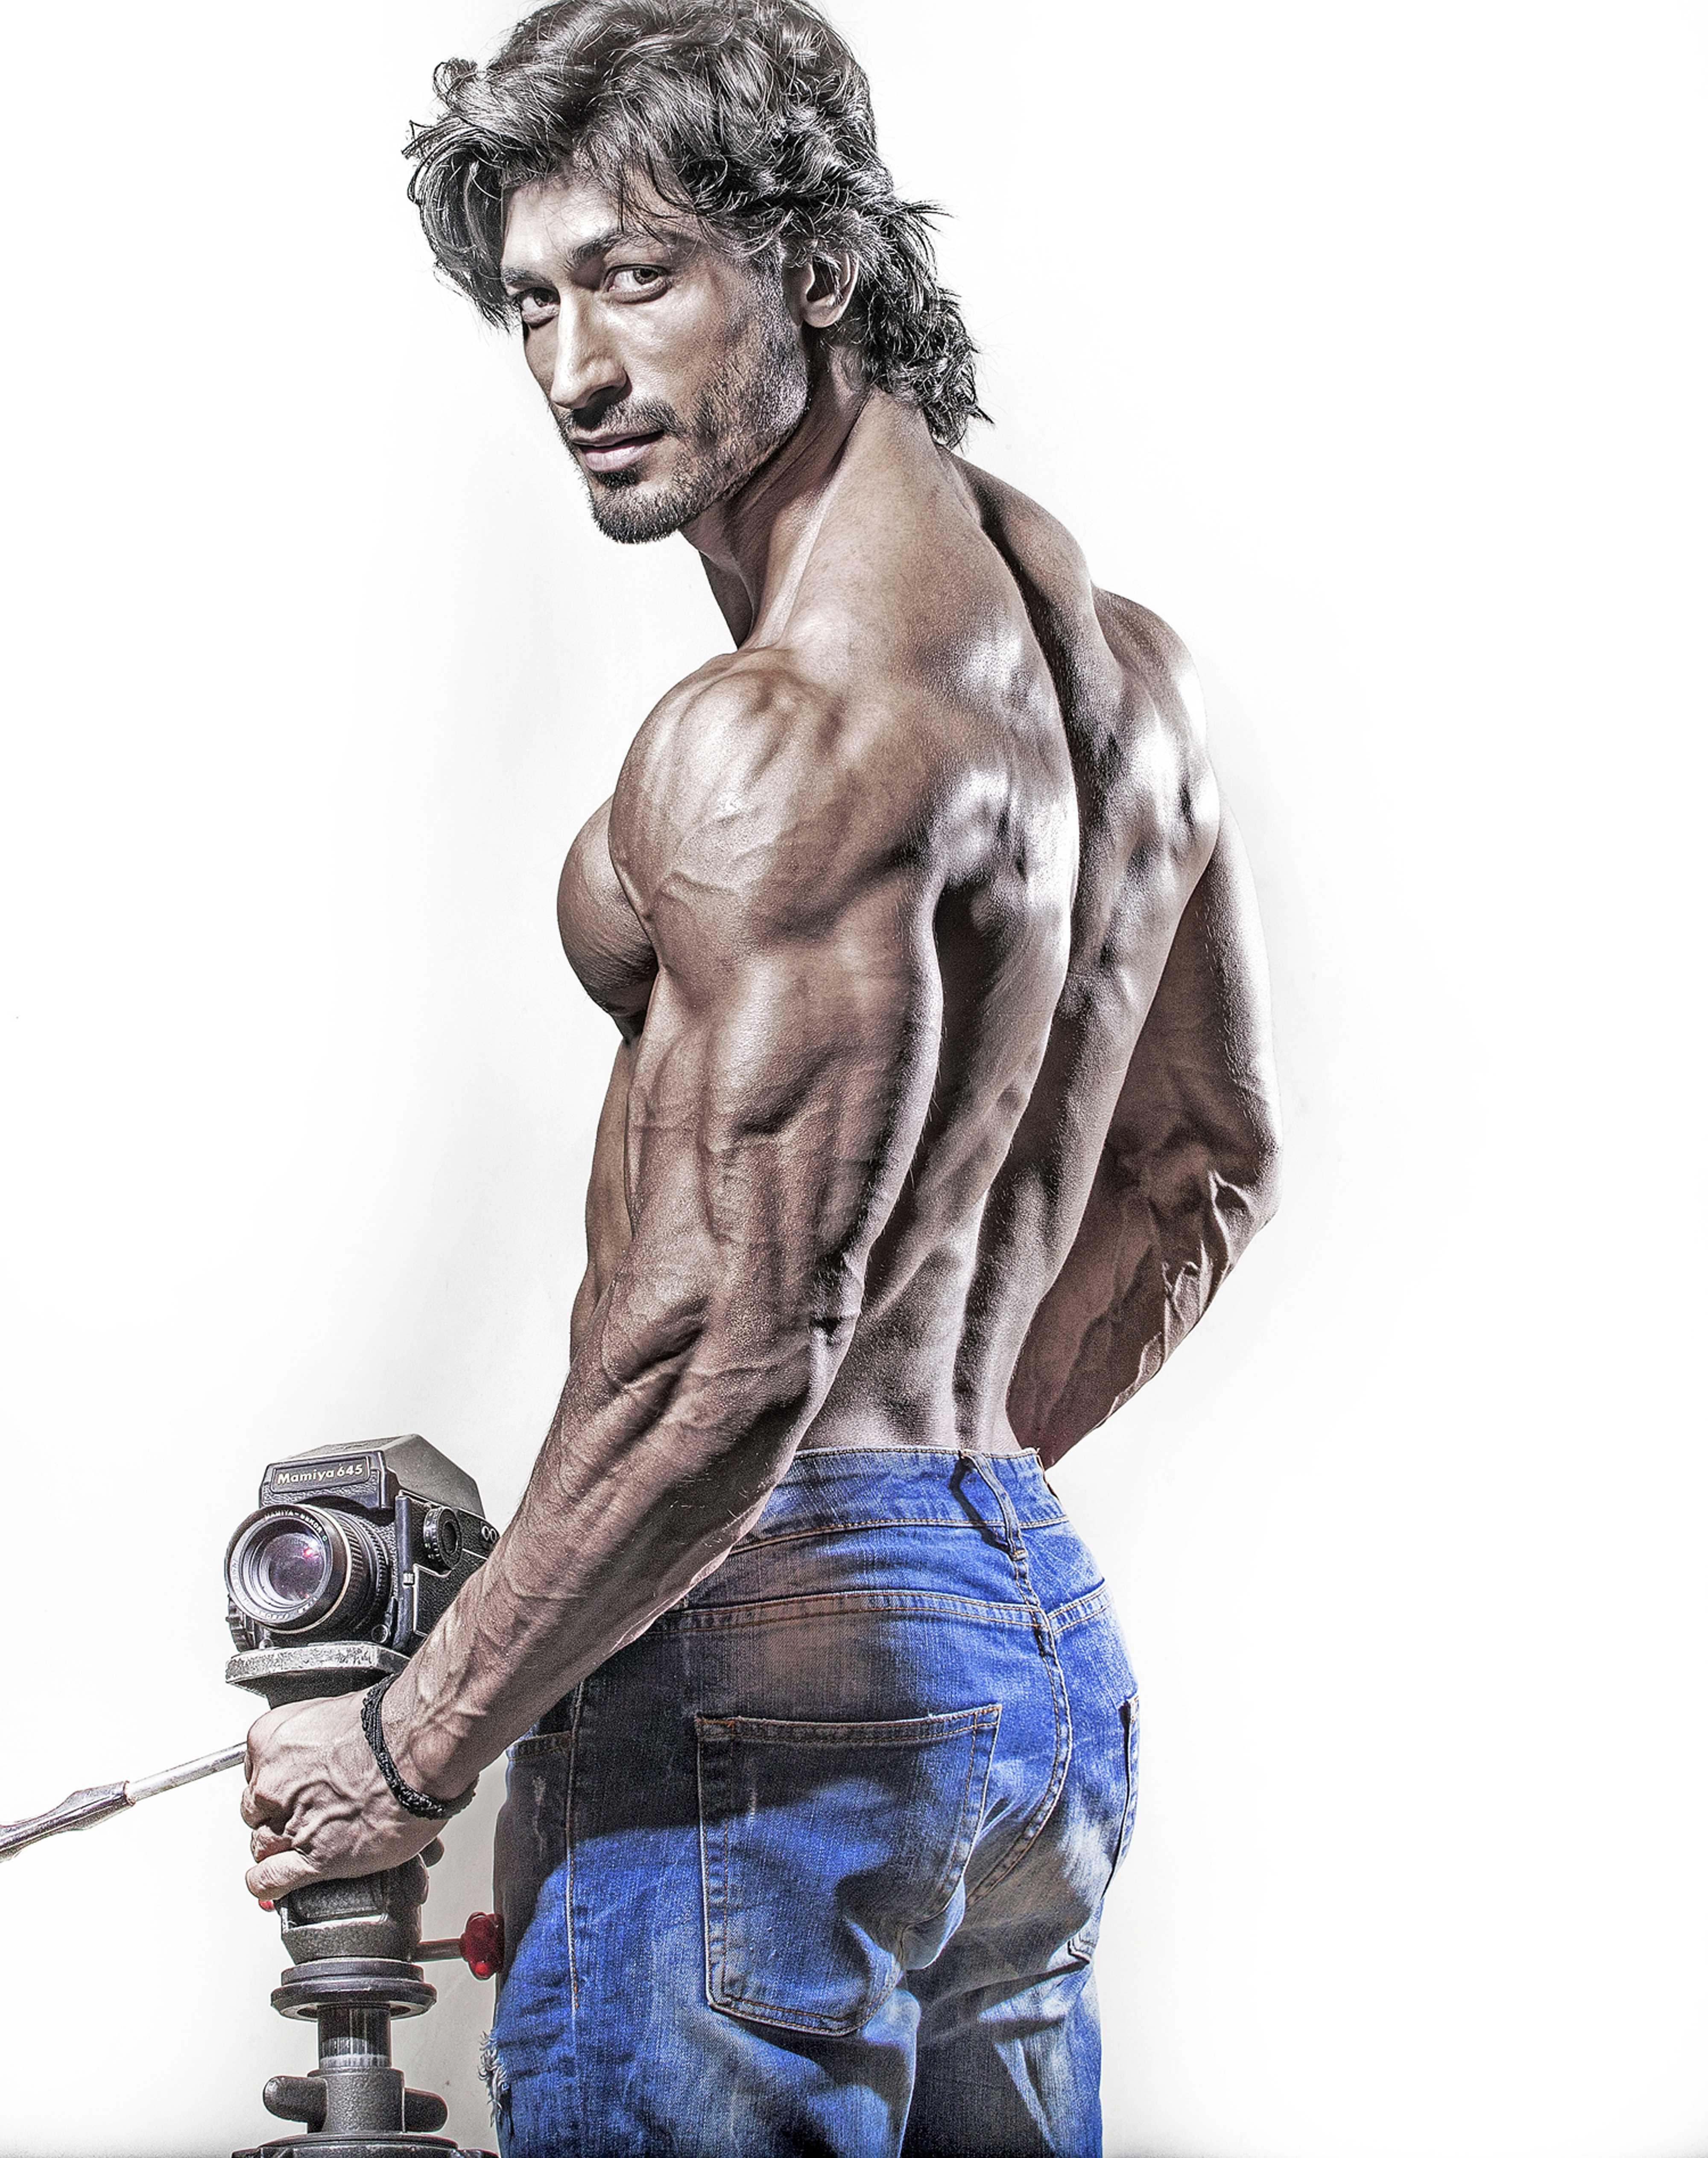 Demolition Man Vidyut Jammwal debunks 4 fitness myths you thought